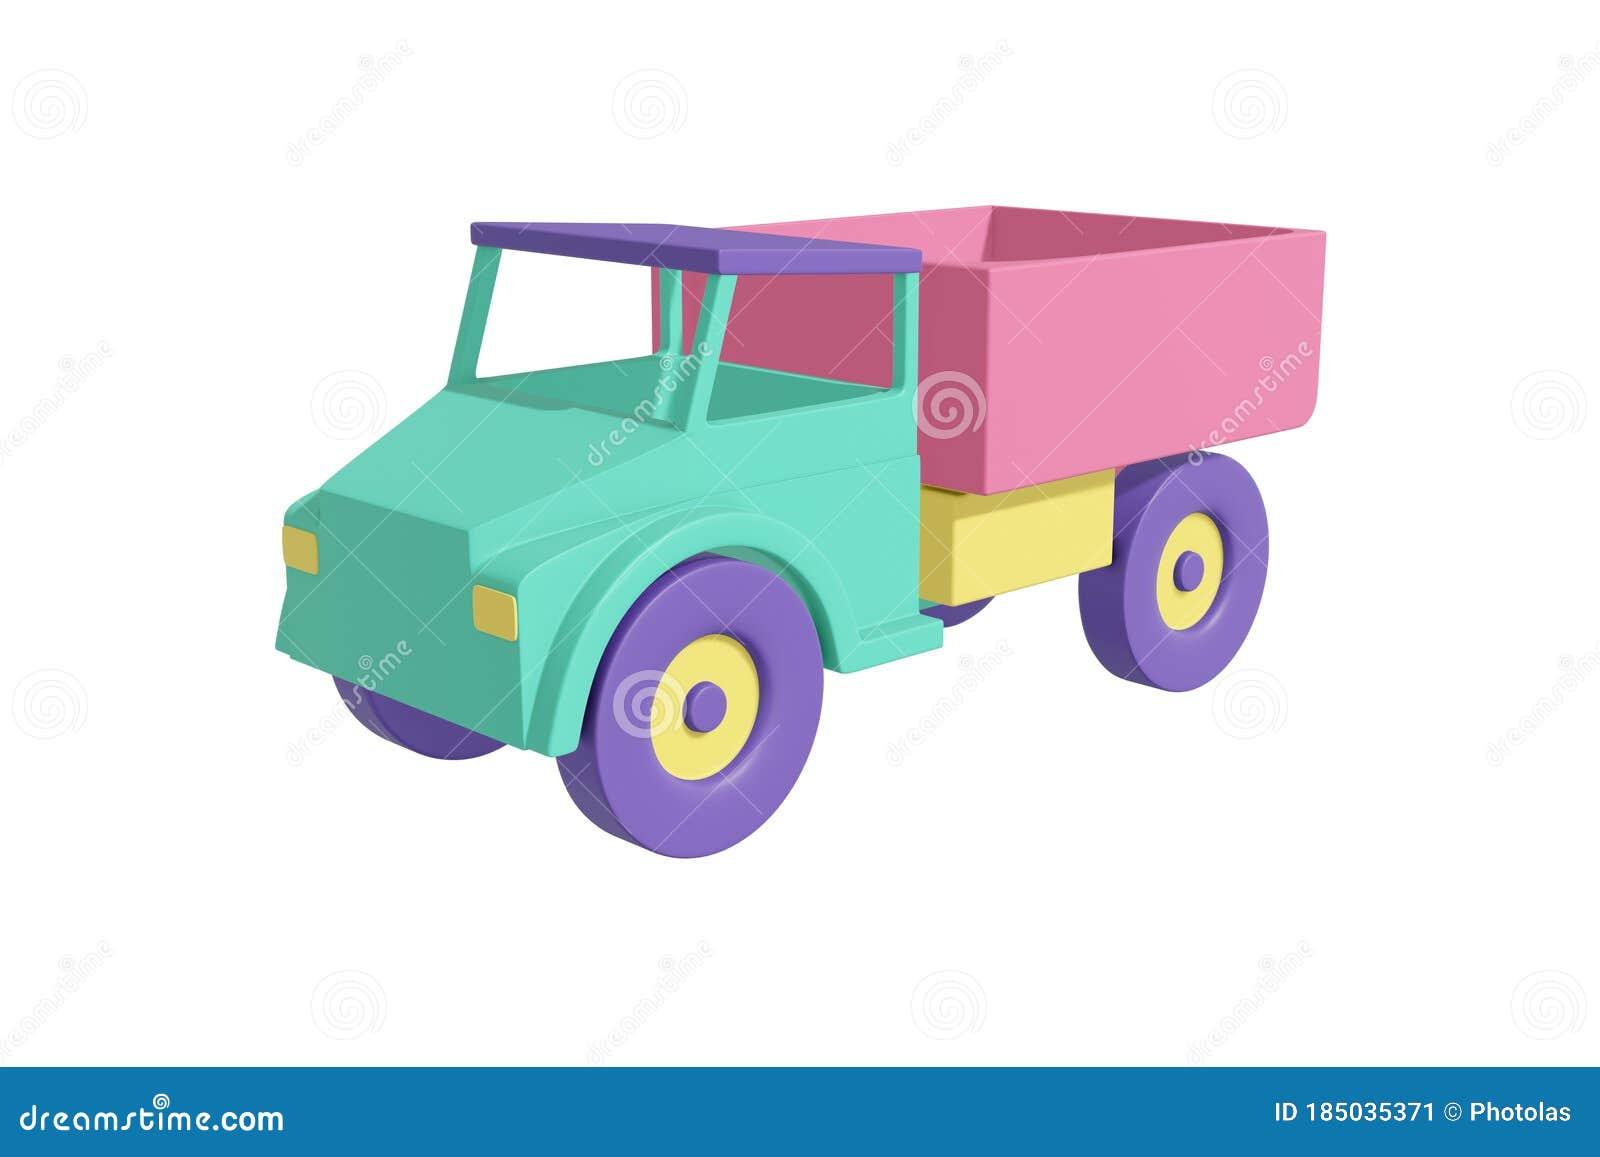 Cartoon Purple Car Stock Illustrations 569 Cartoon Purple Car Stock Illustrations Vectors Clipart Dreamstime